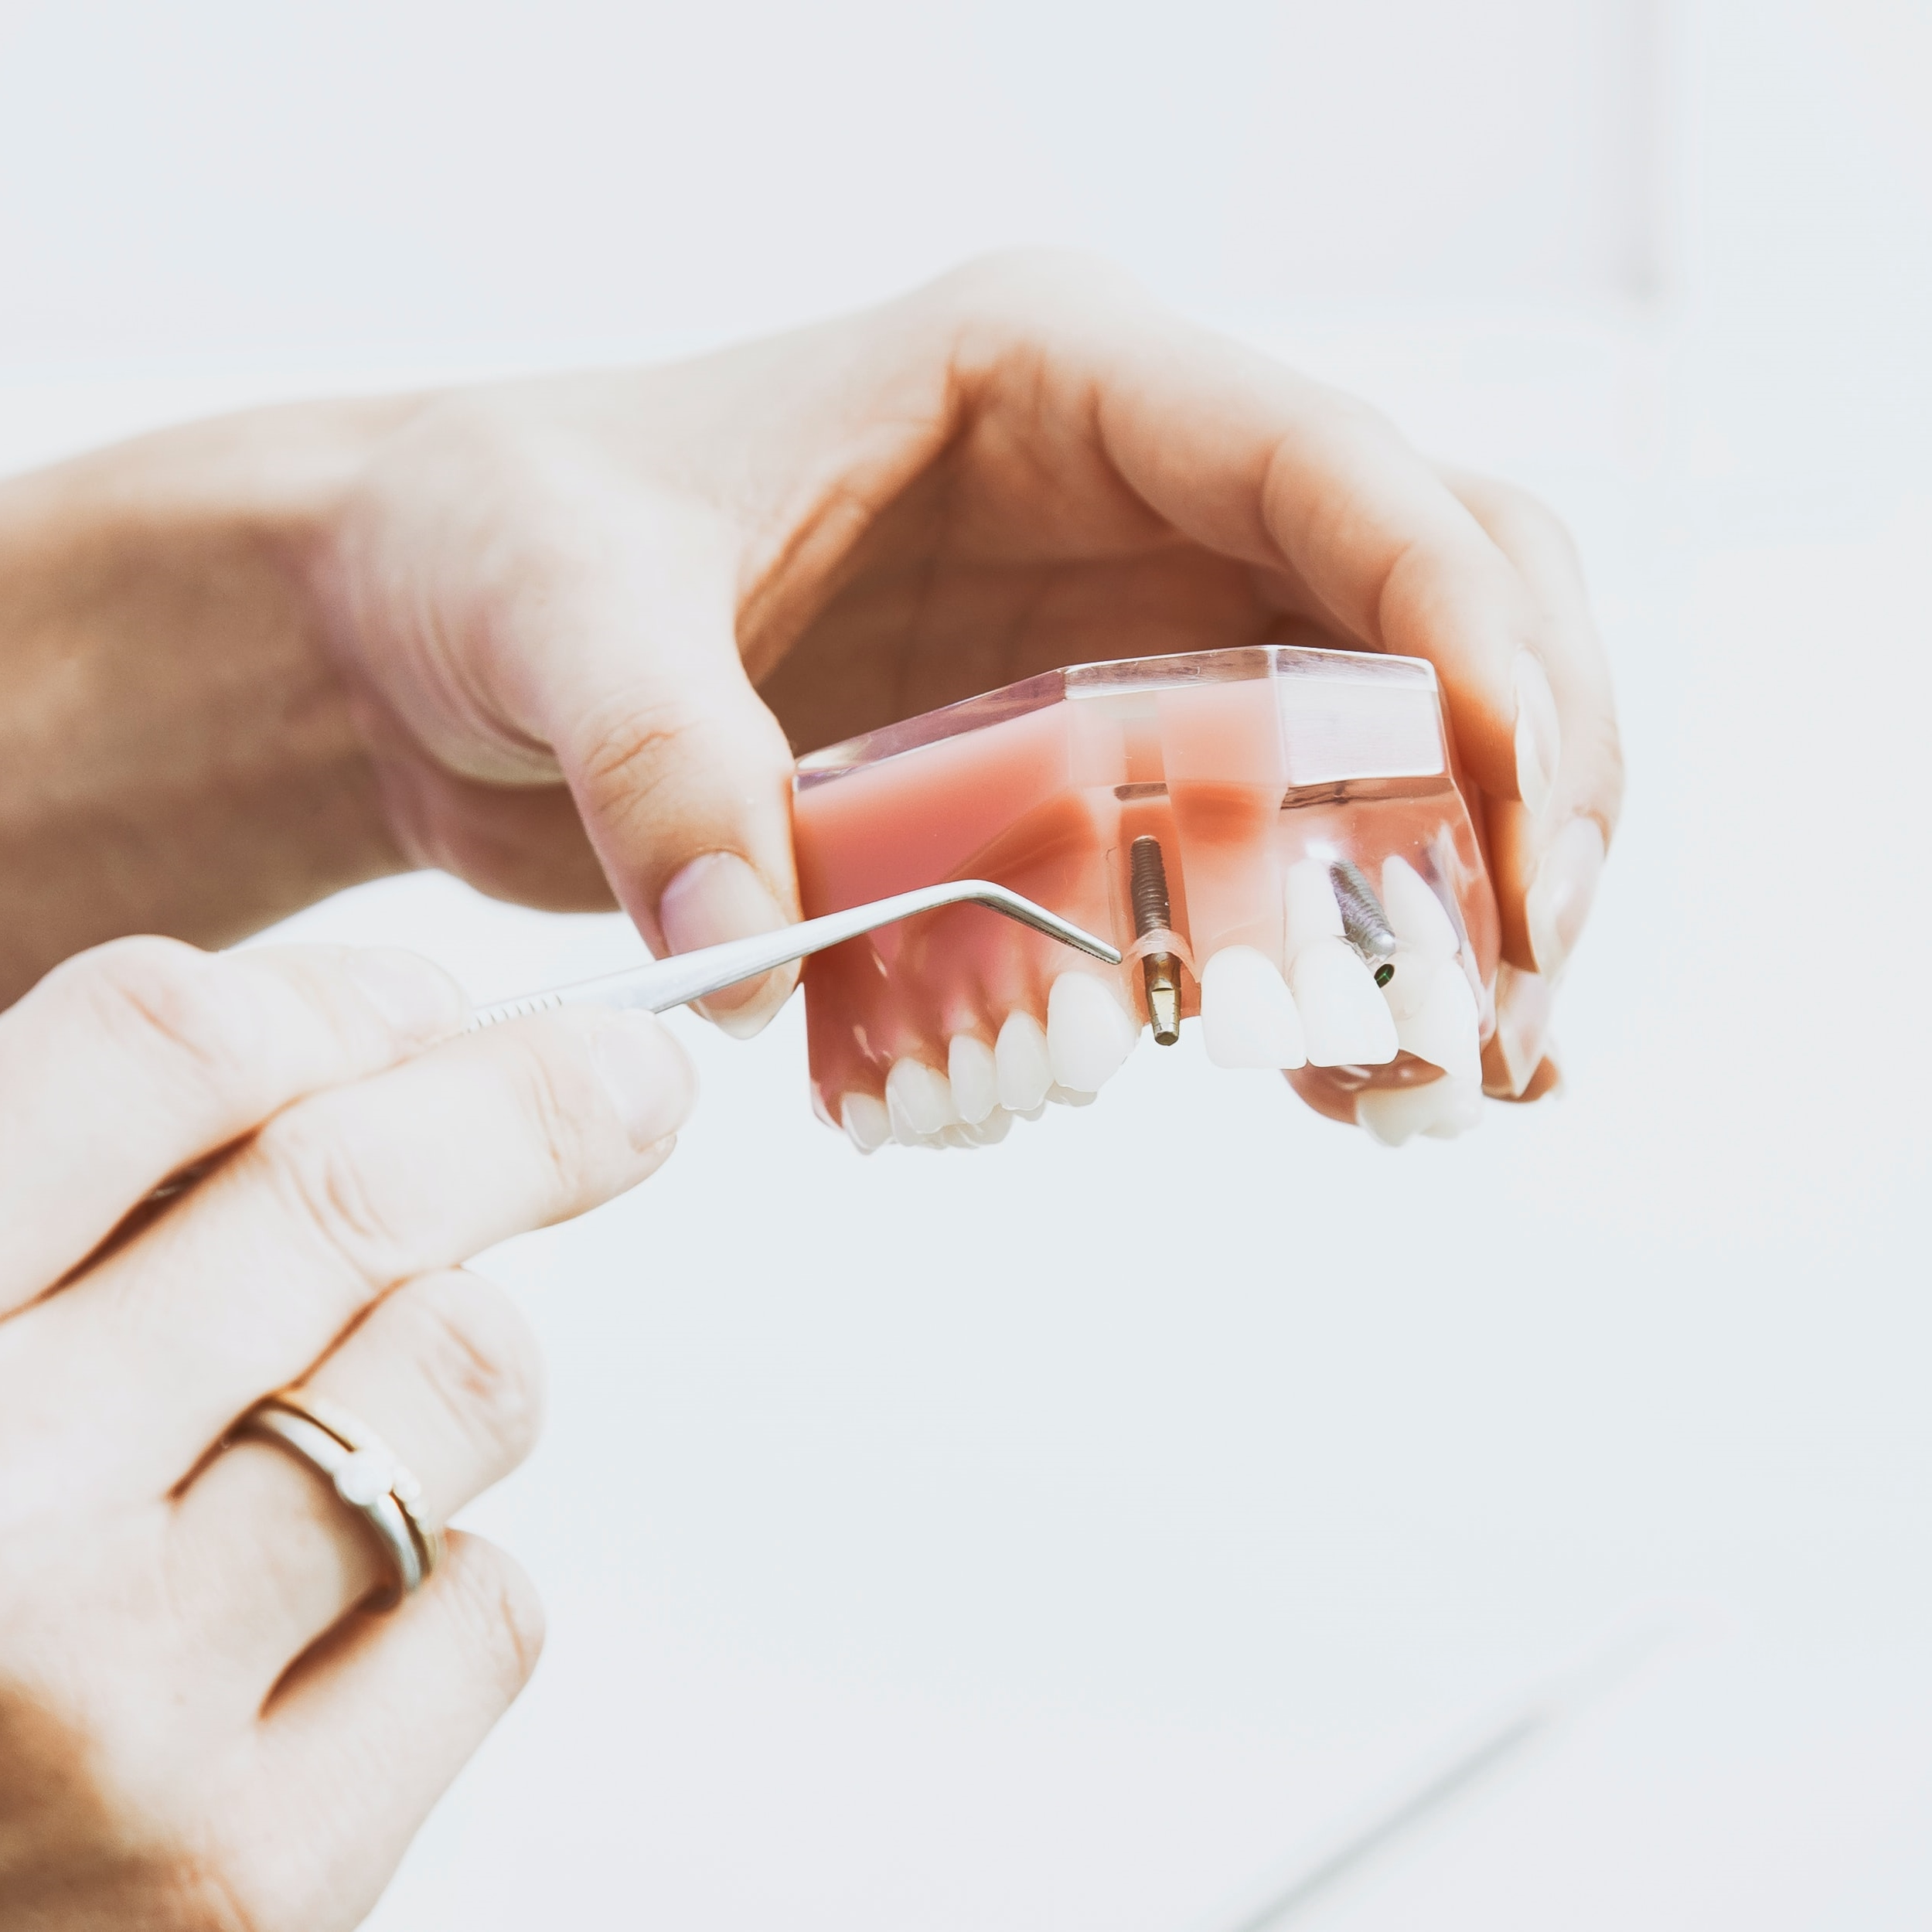 dantų implantavimas vilniuje